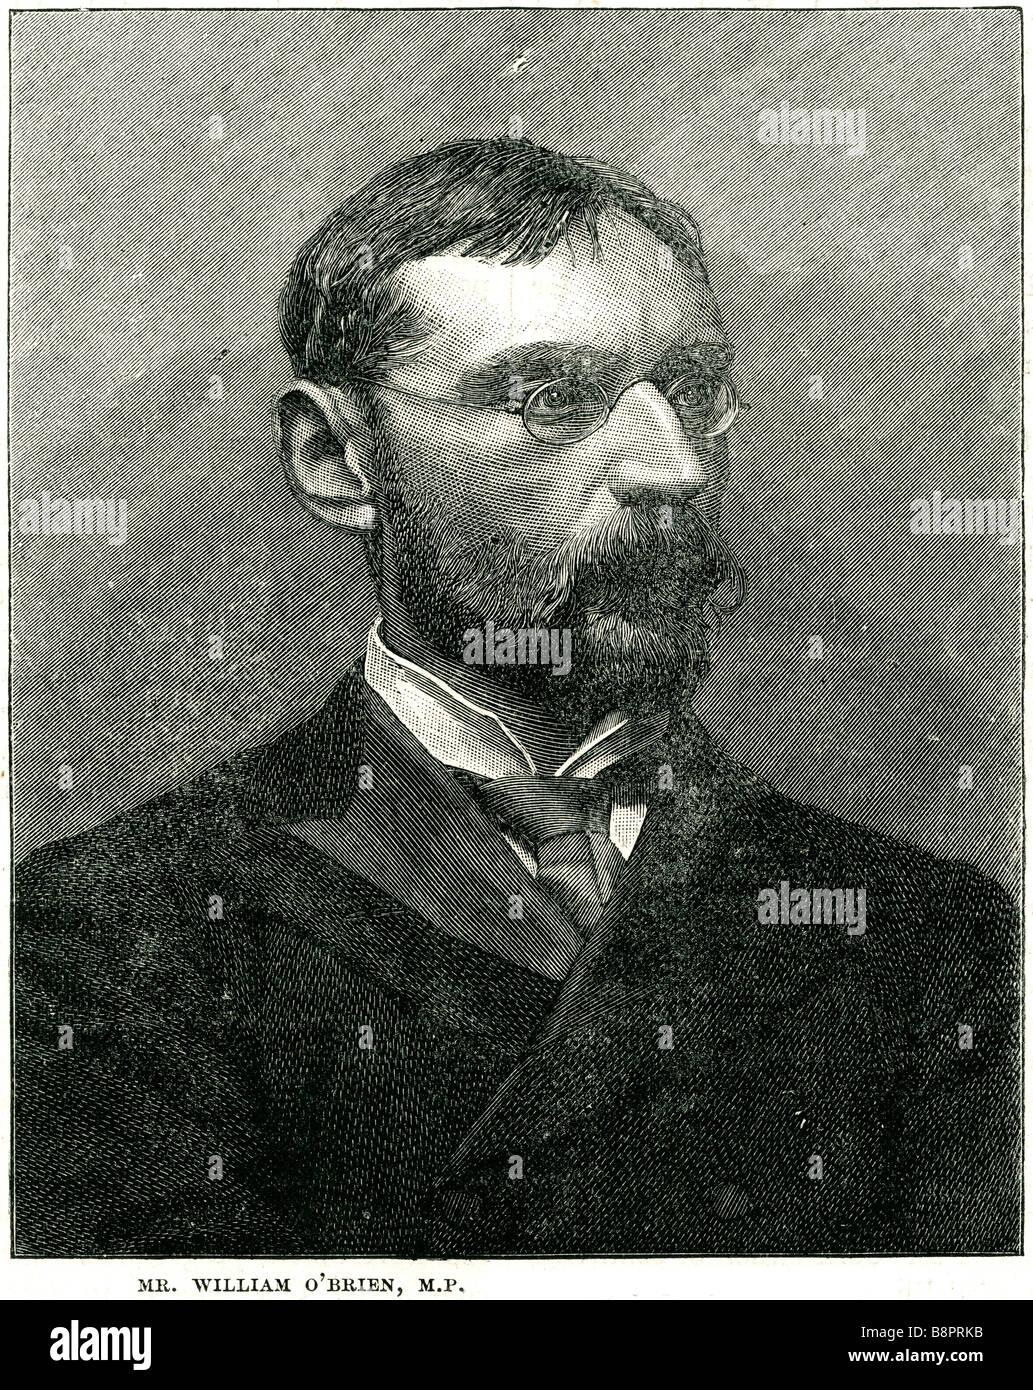 Mr William O'Brien 1852 1928 Member of Parliament Irish nationalist journalist agrarian agitator social revolutionary - Stock Image